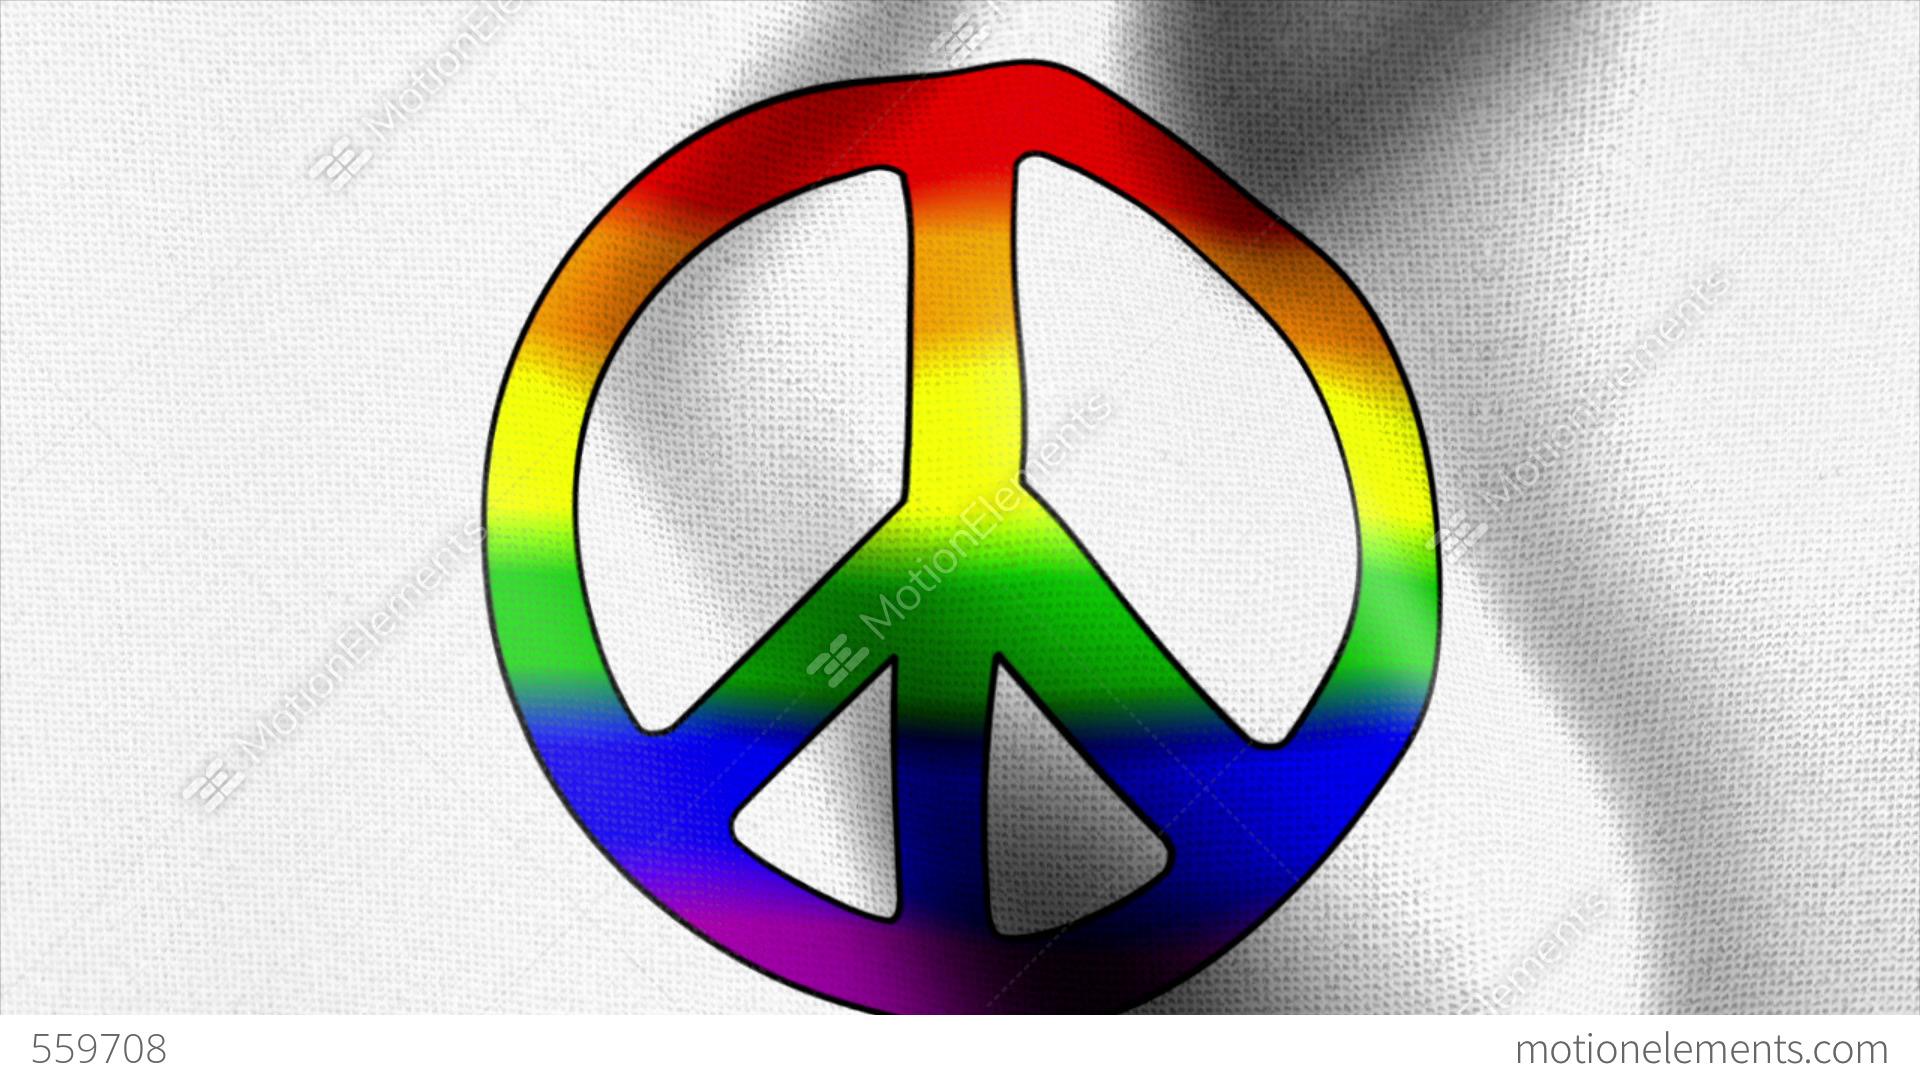 Waving flag rainbow peace sign stock animation 559708 waving flag rainbow peace sign stock video footage biocorpaavc